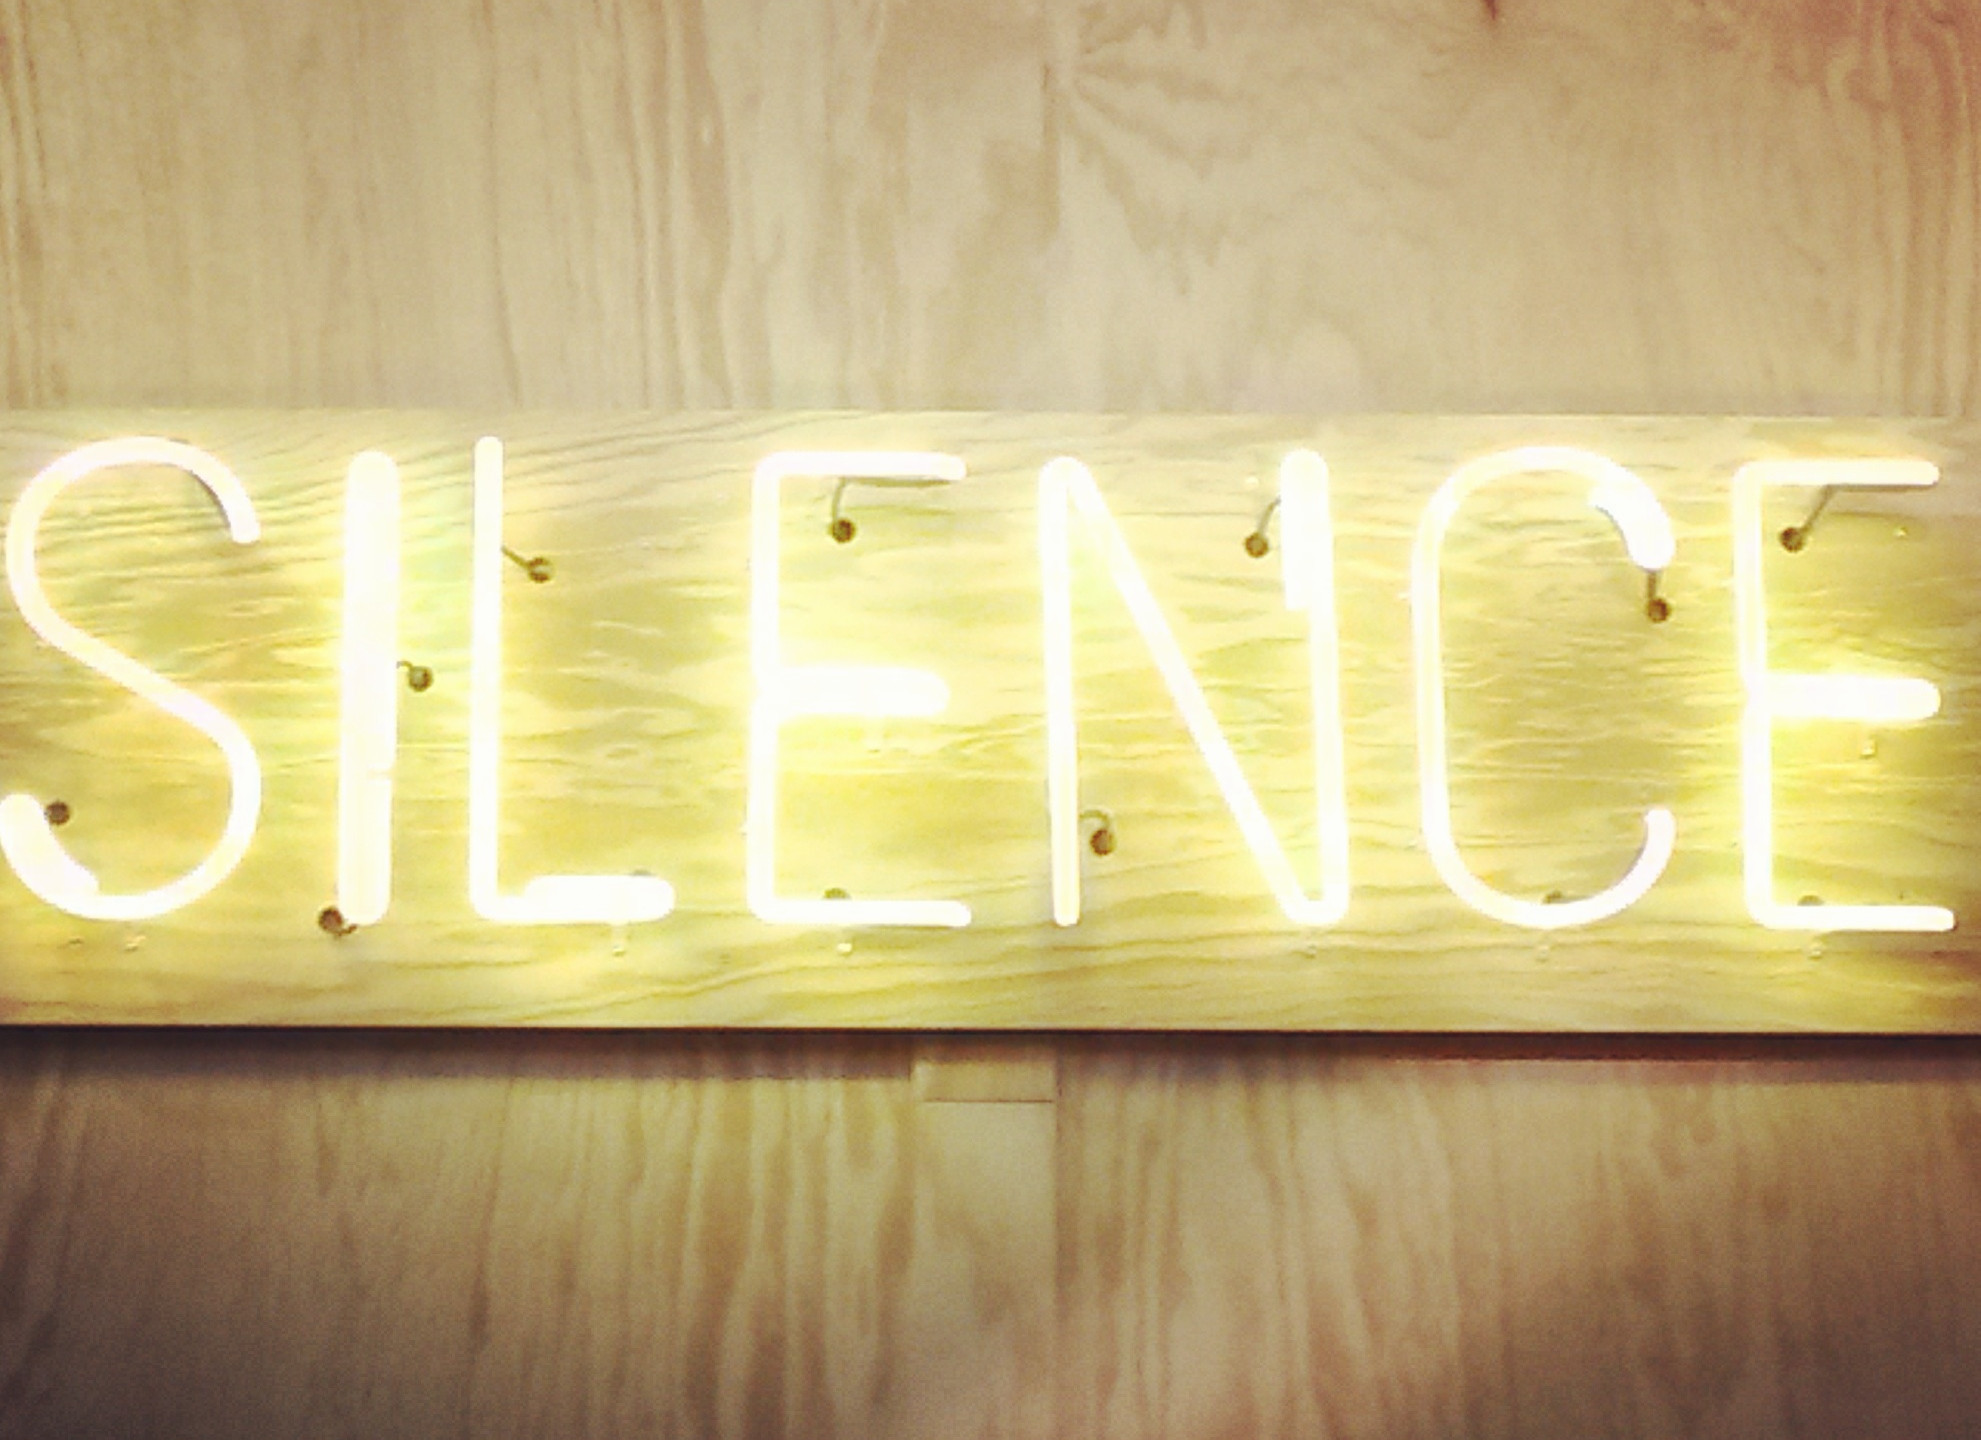 Silence-MO17